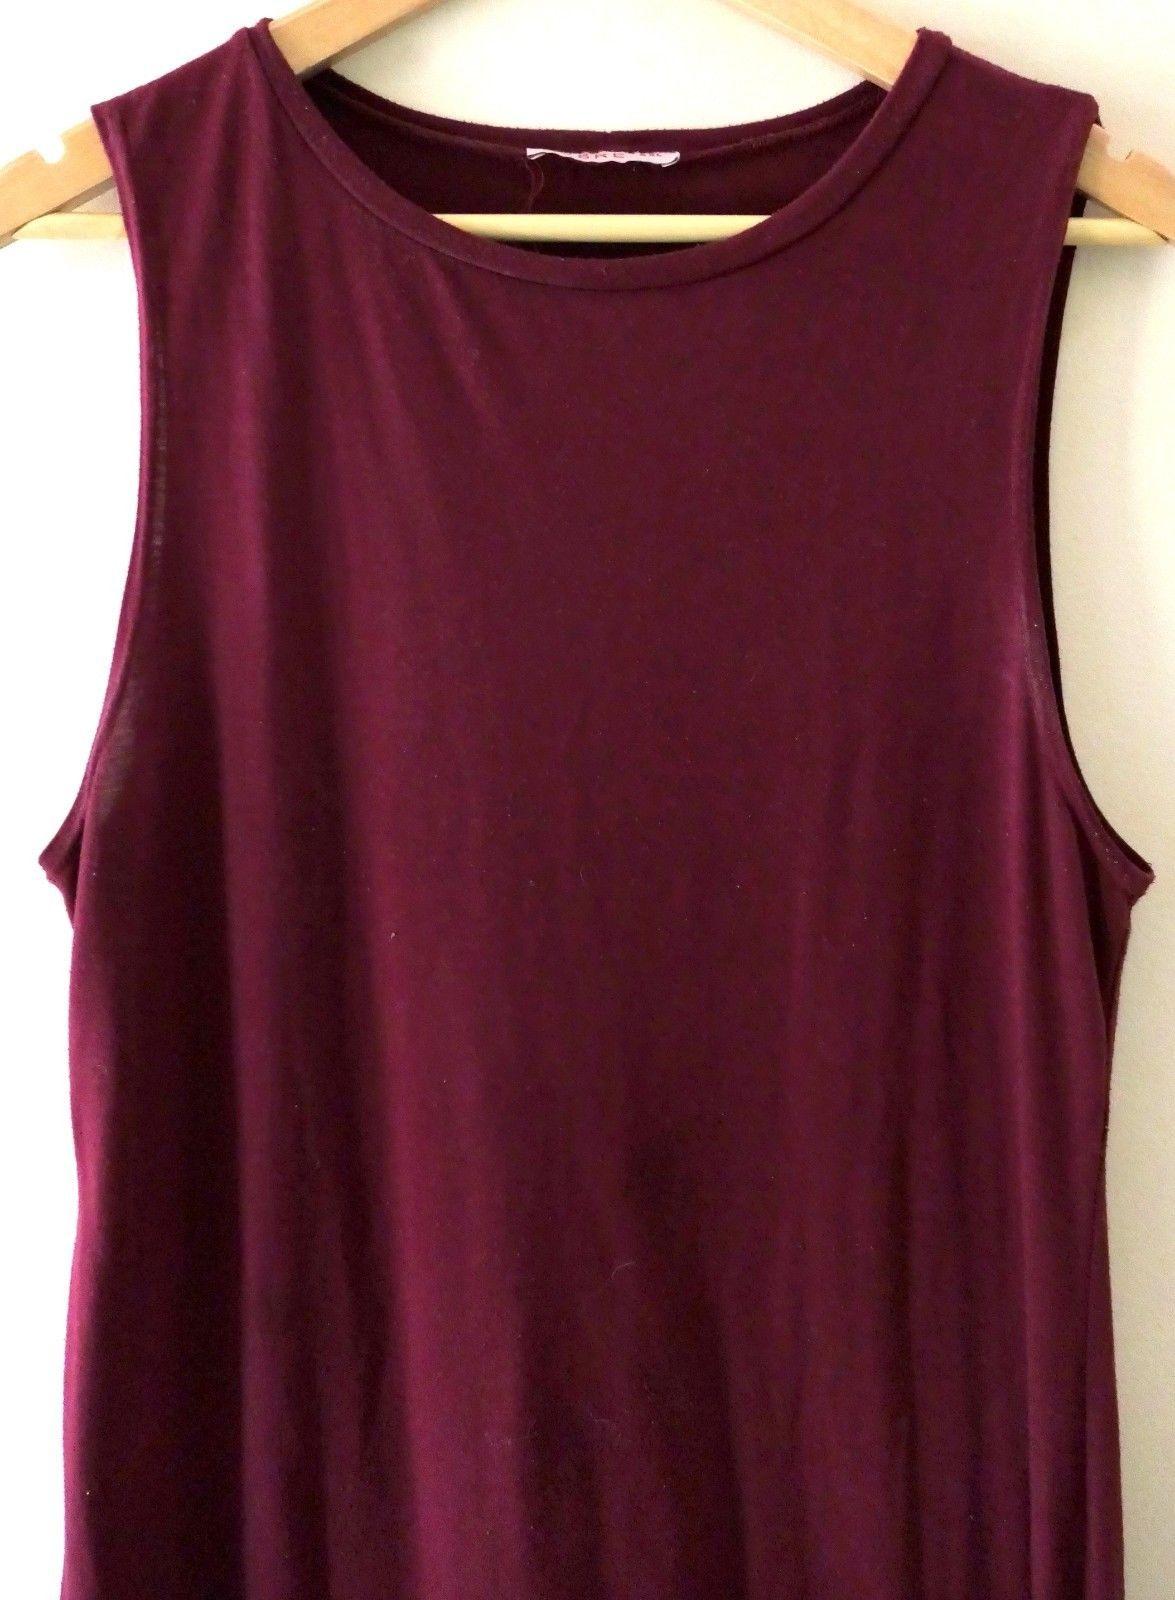 Michelle Bridges Size 18 Singlet Activewear Top Women's Clothing Activewear